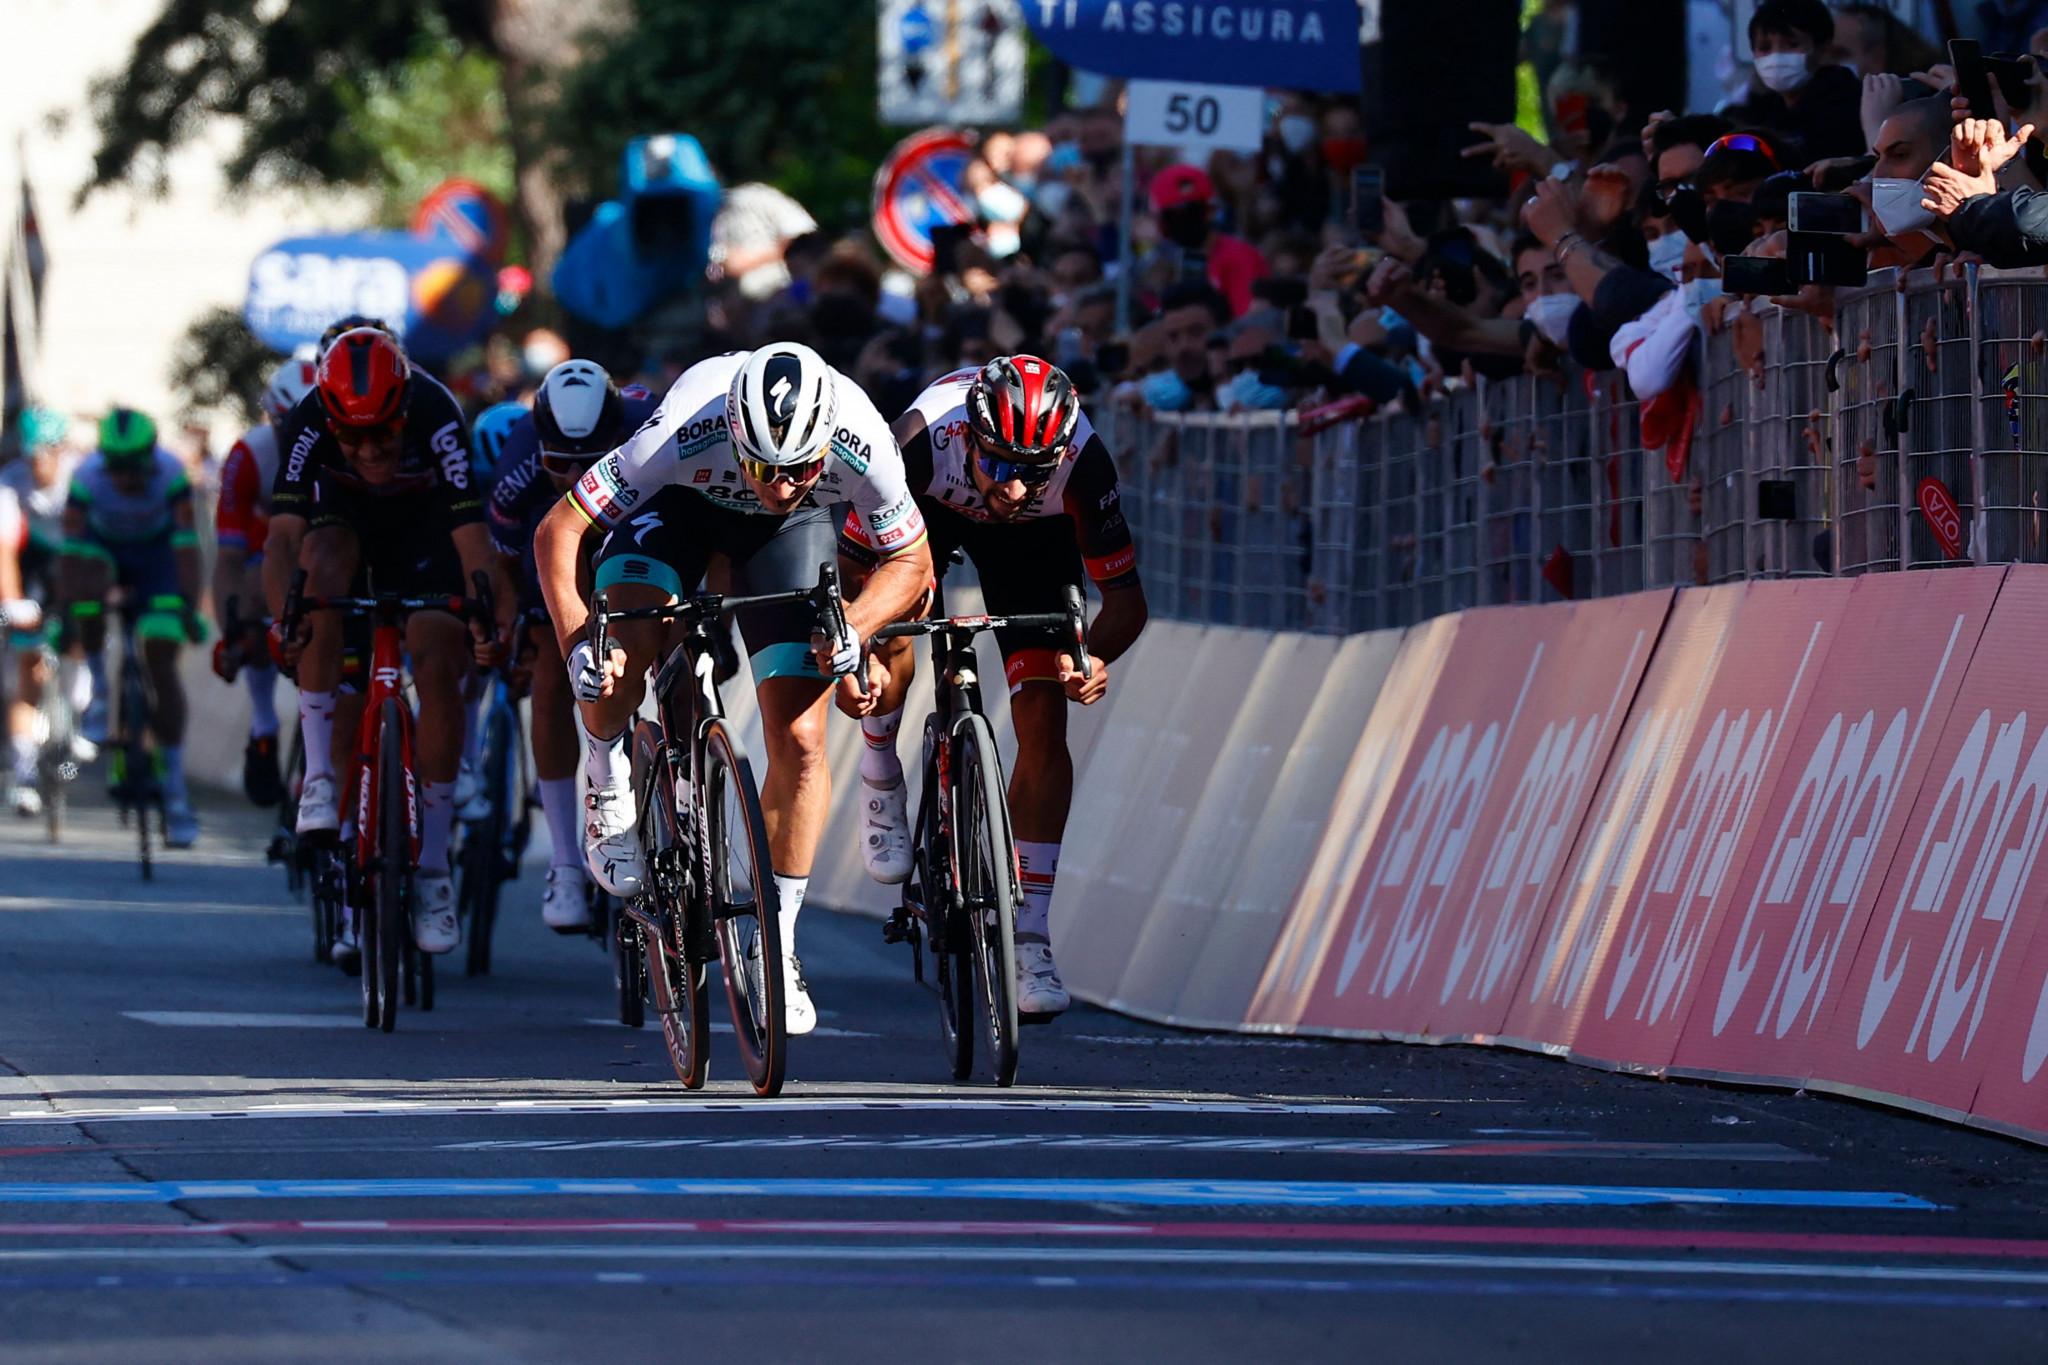 Sagan secures sprint win on stage 10 of Giro d'Italia to reward team's hard work